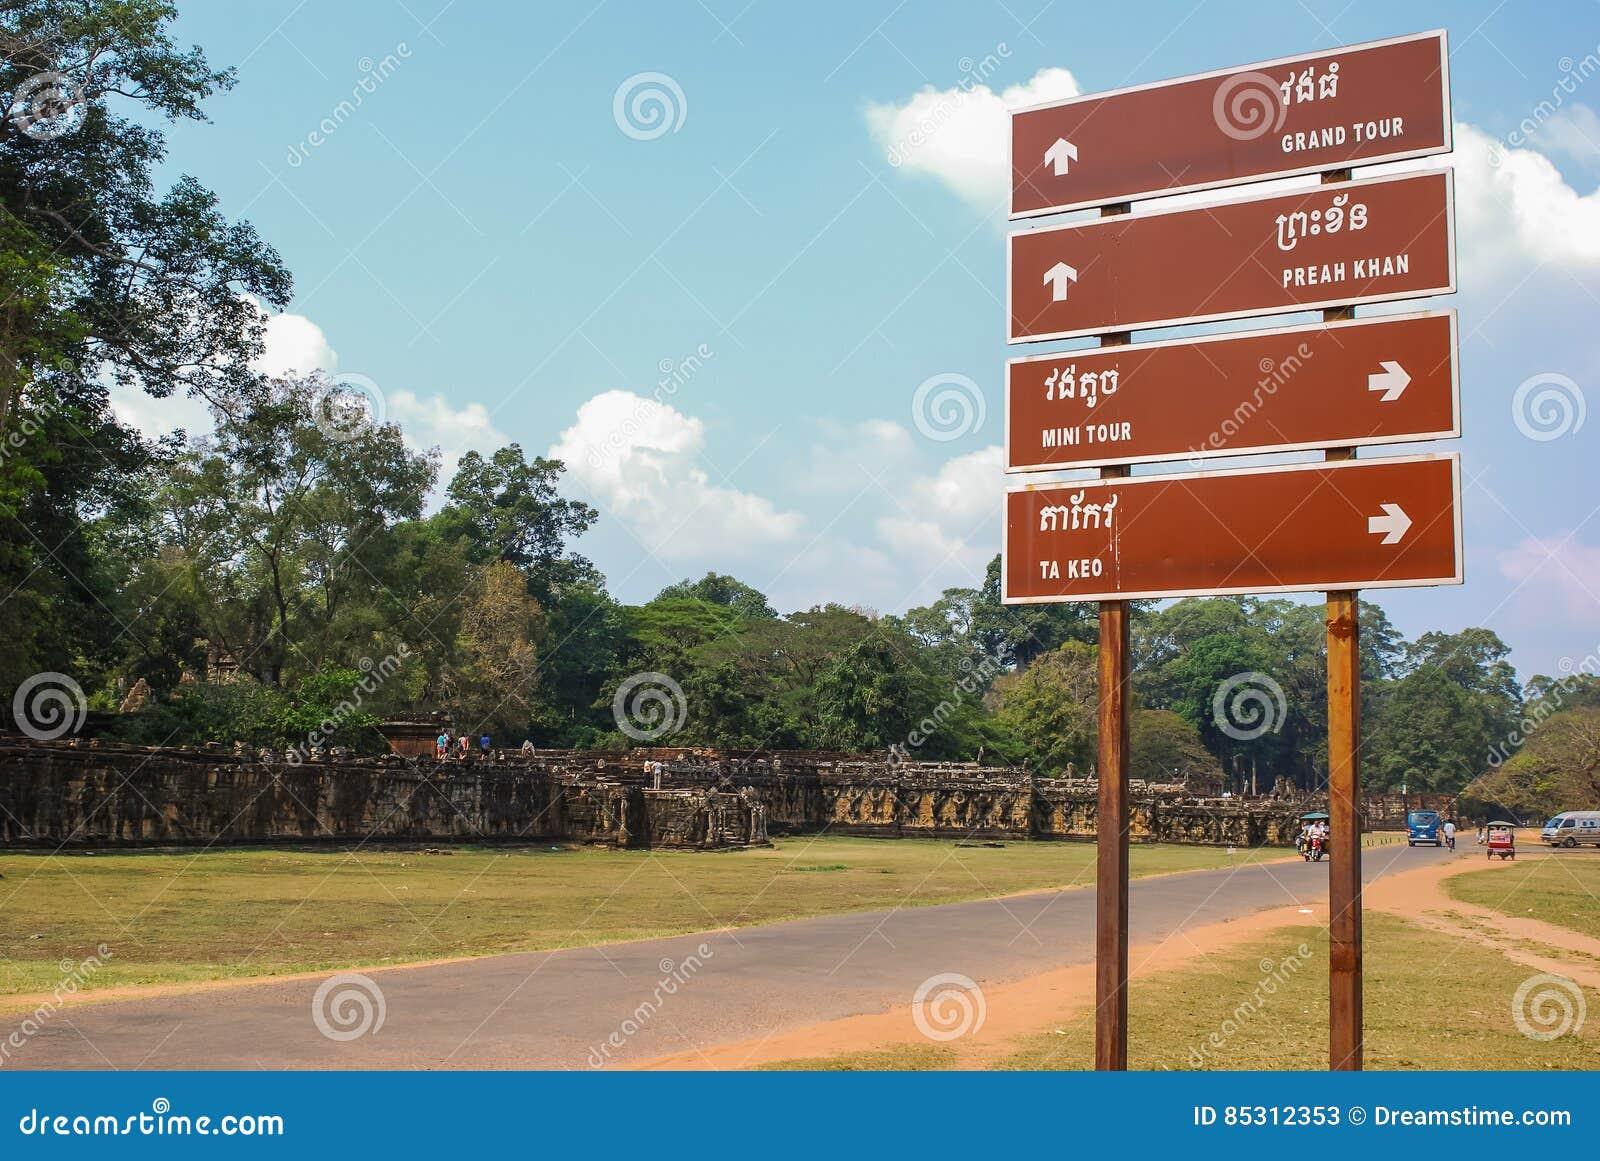 Angkor Thom siemreap, Kambodja